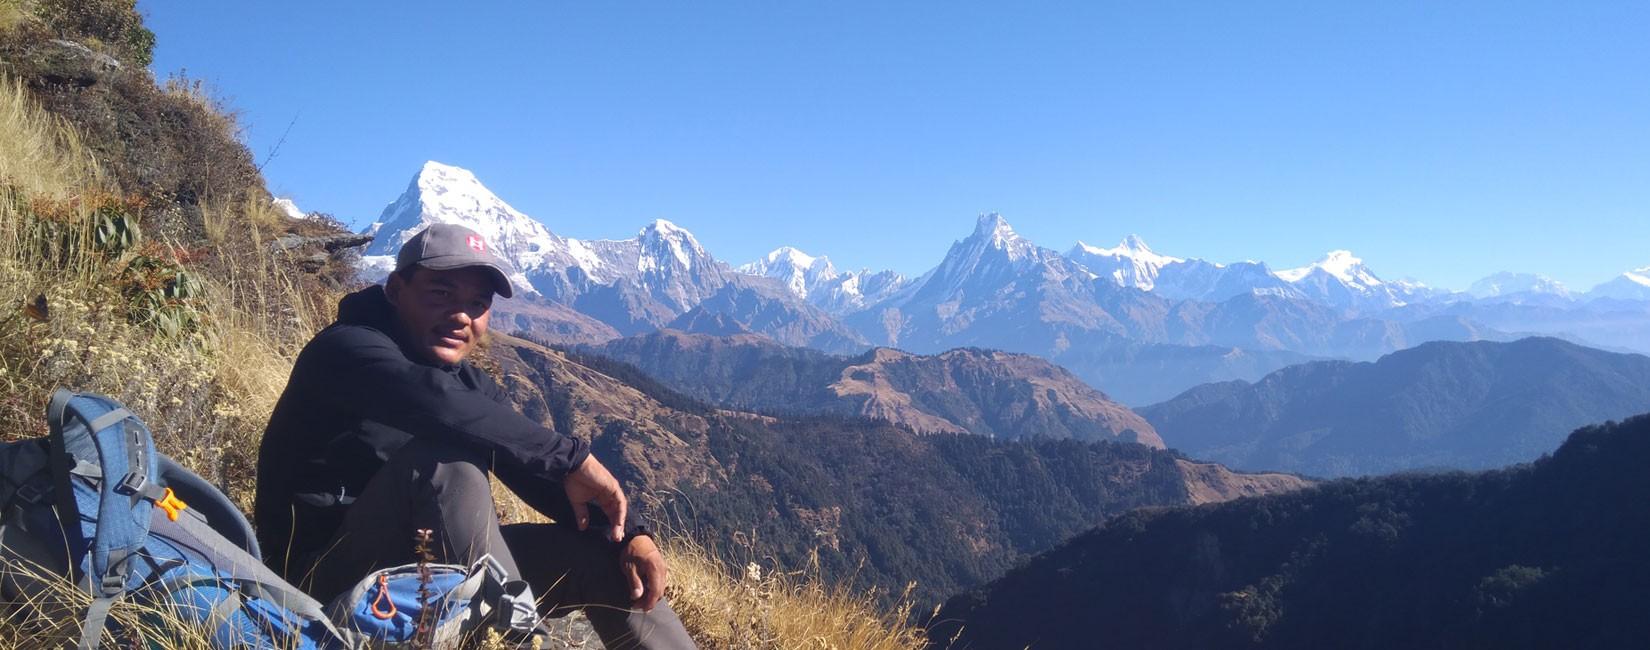 Kanchenjunga Region Trek